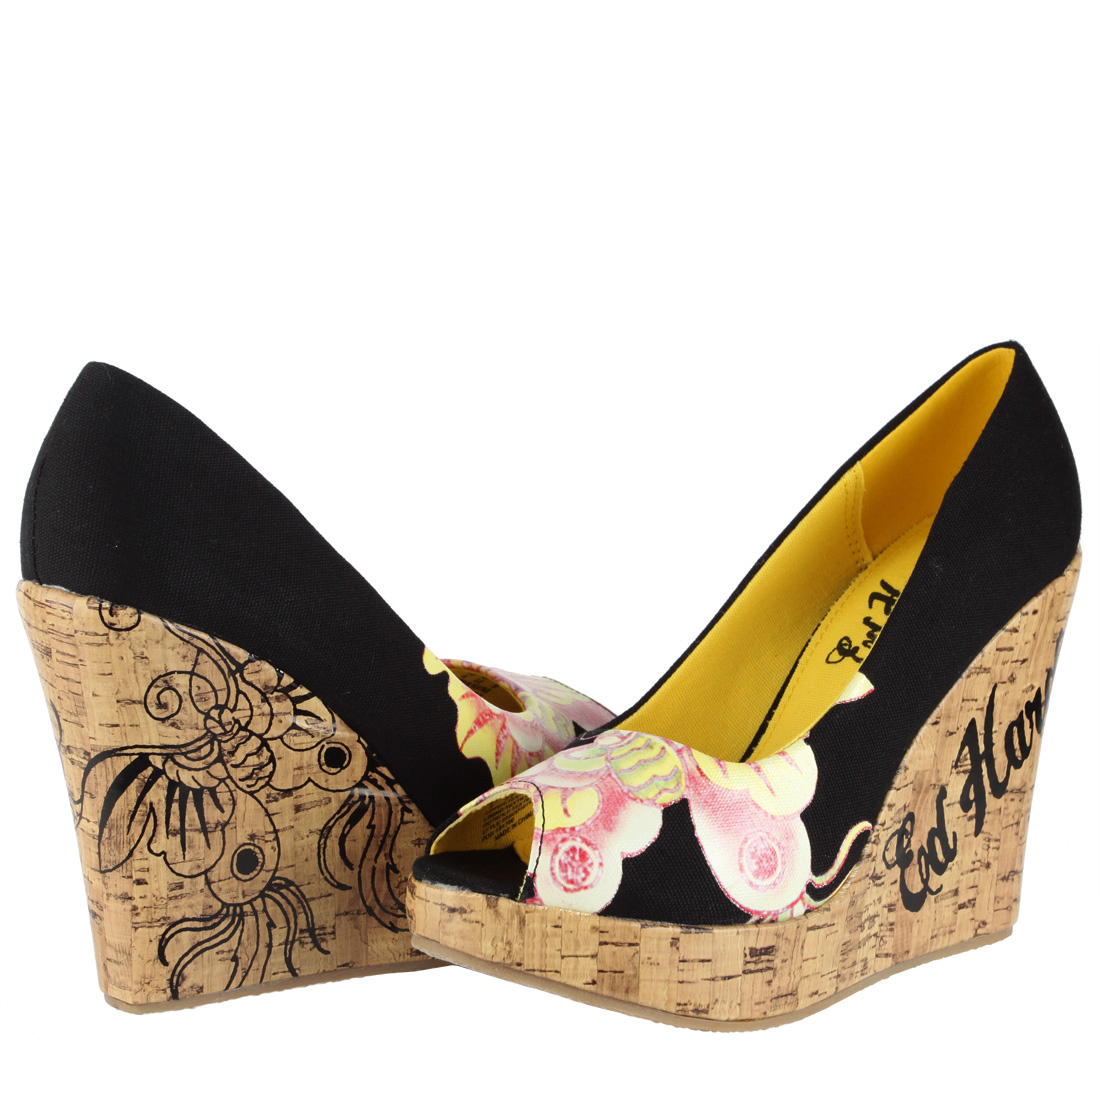 Ed Hardy Womens Wedge Shoes